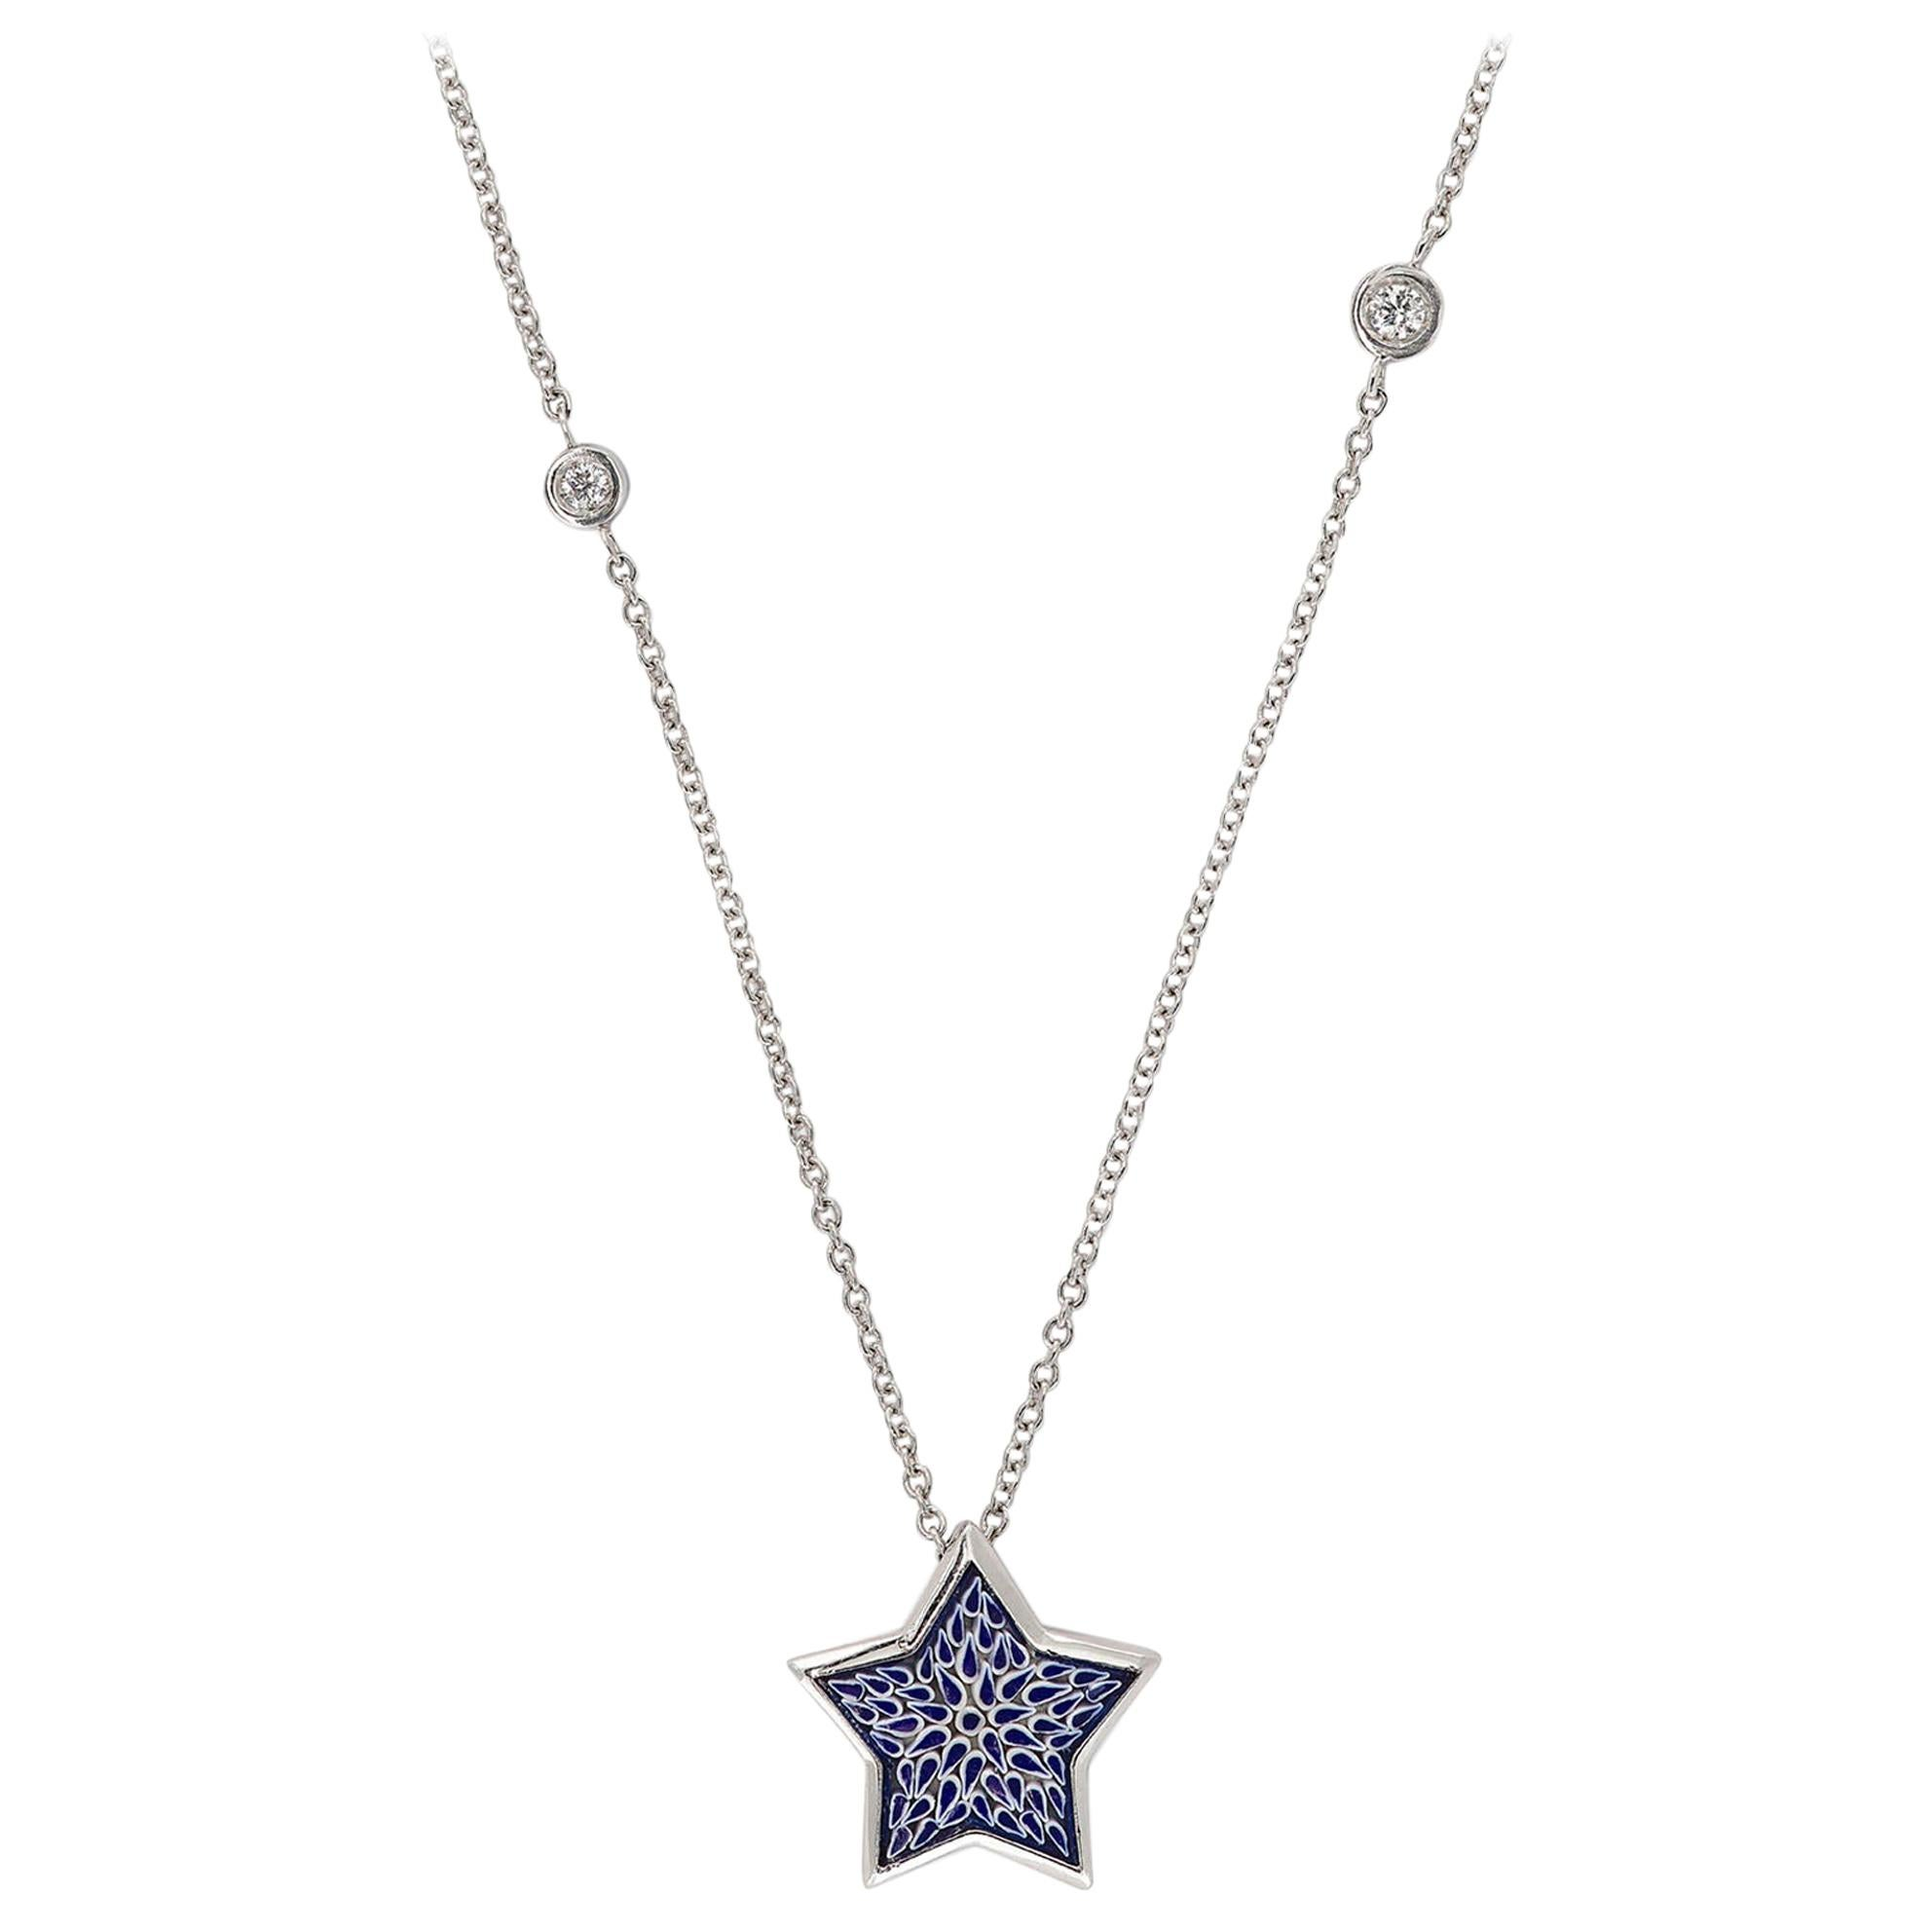 Stylish Necklace White Gold White Diamonds HandDecorated with MicroMosaic